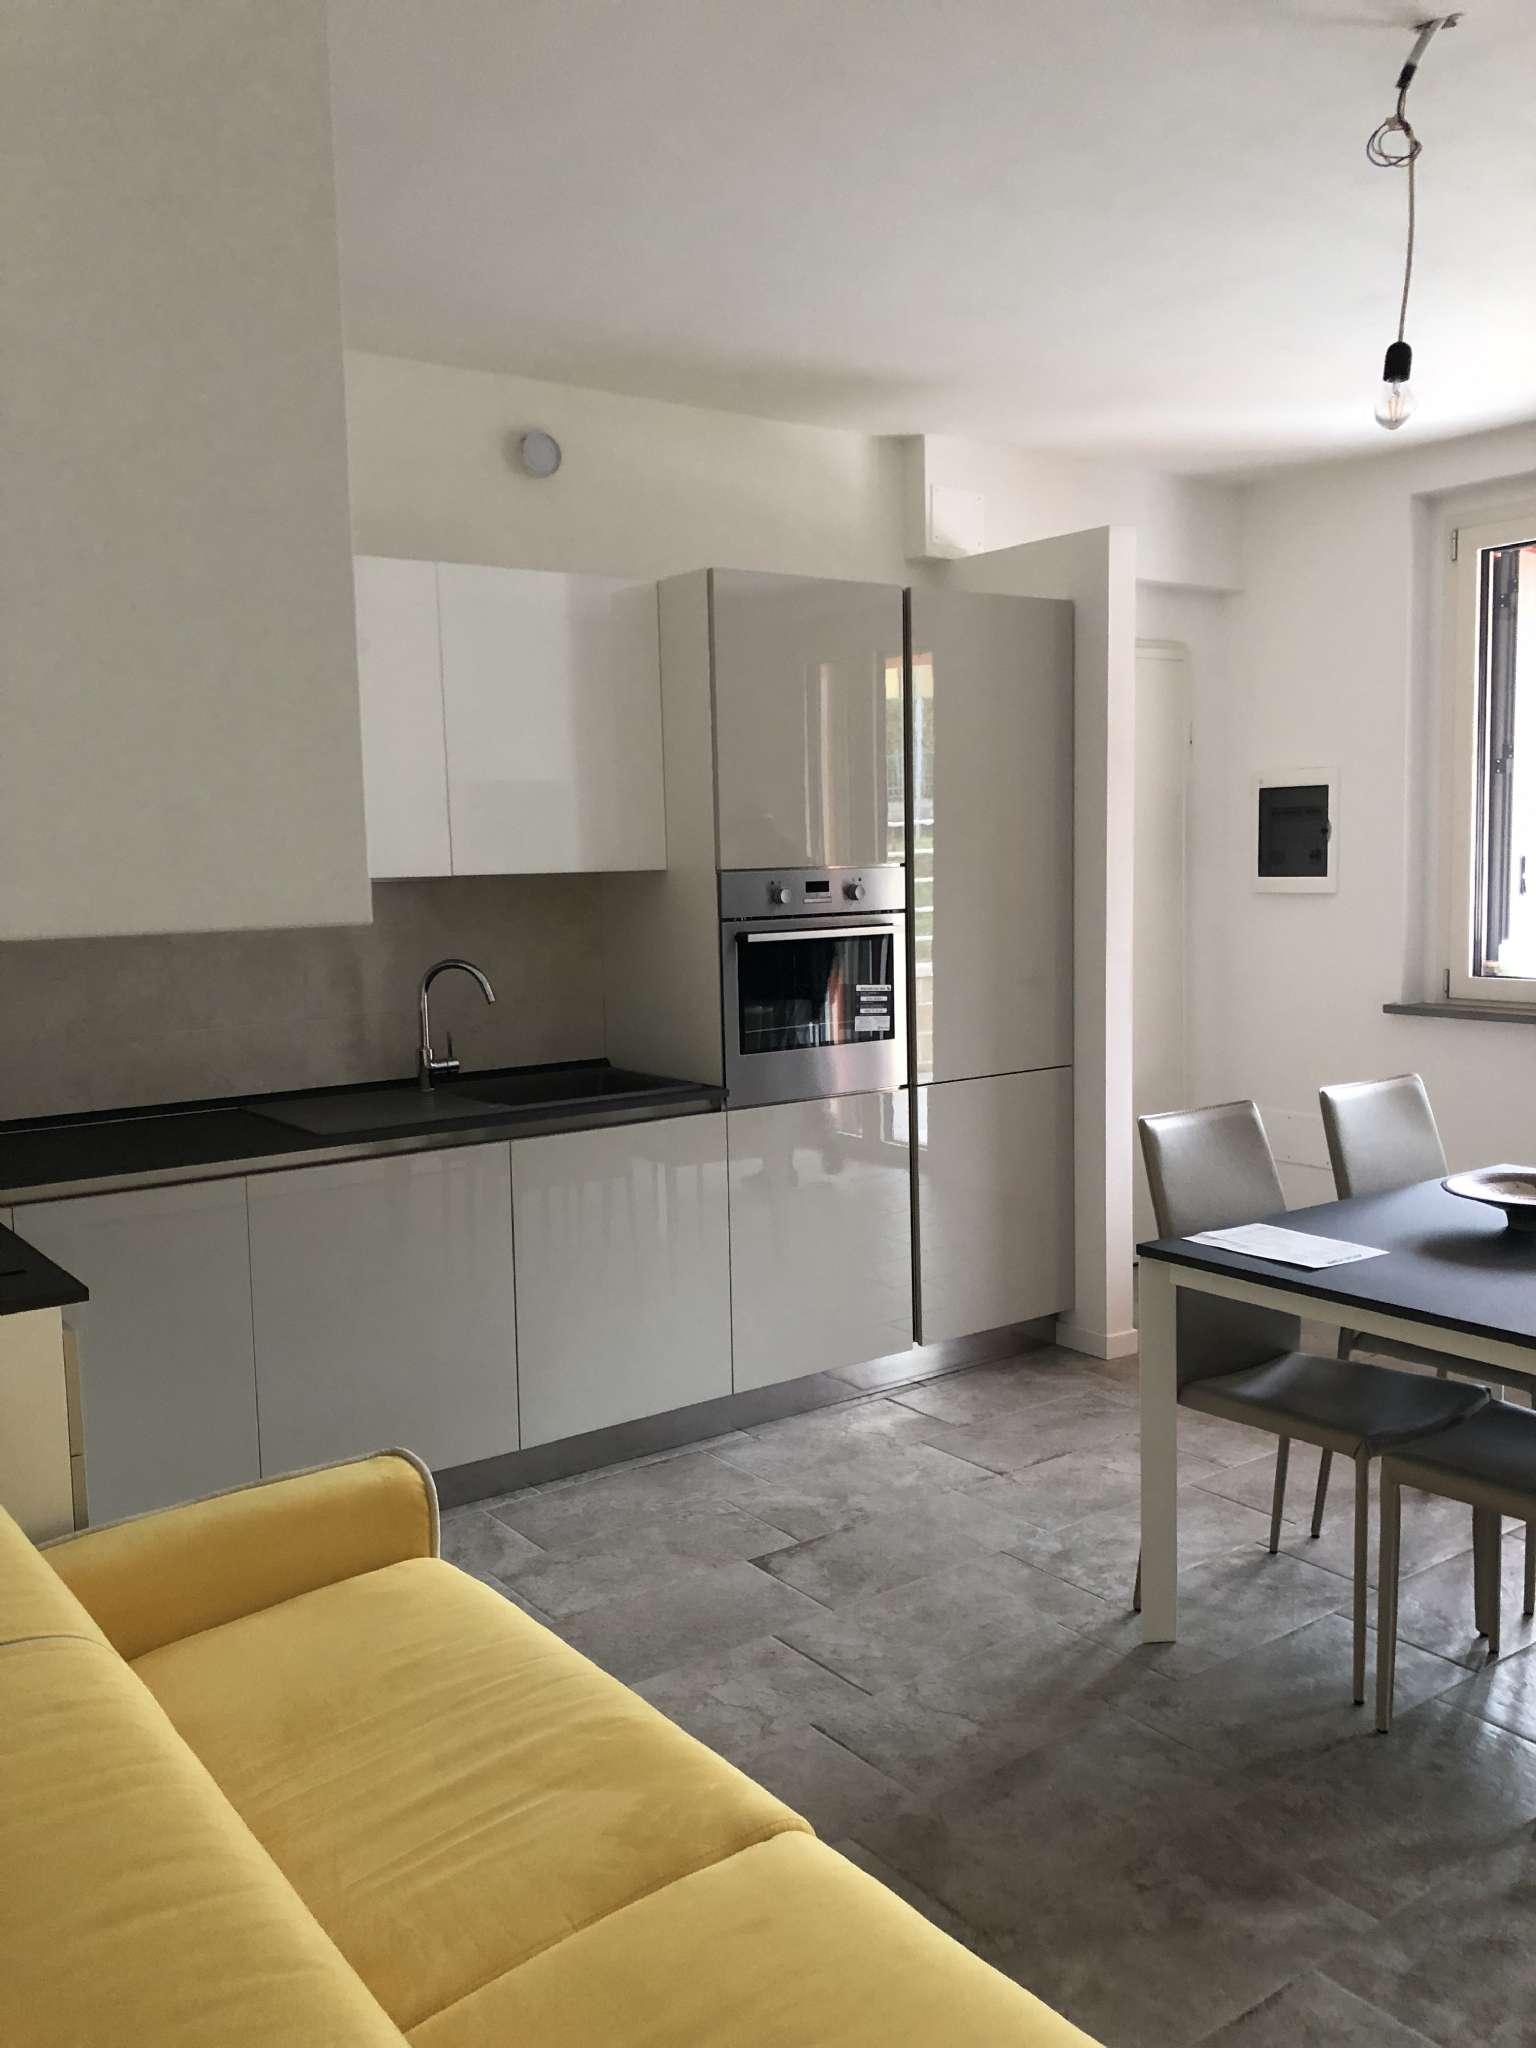 Appartamento nuovo con giardino